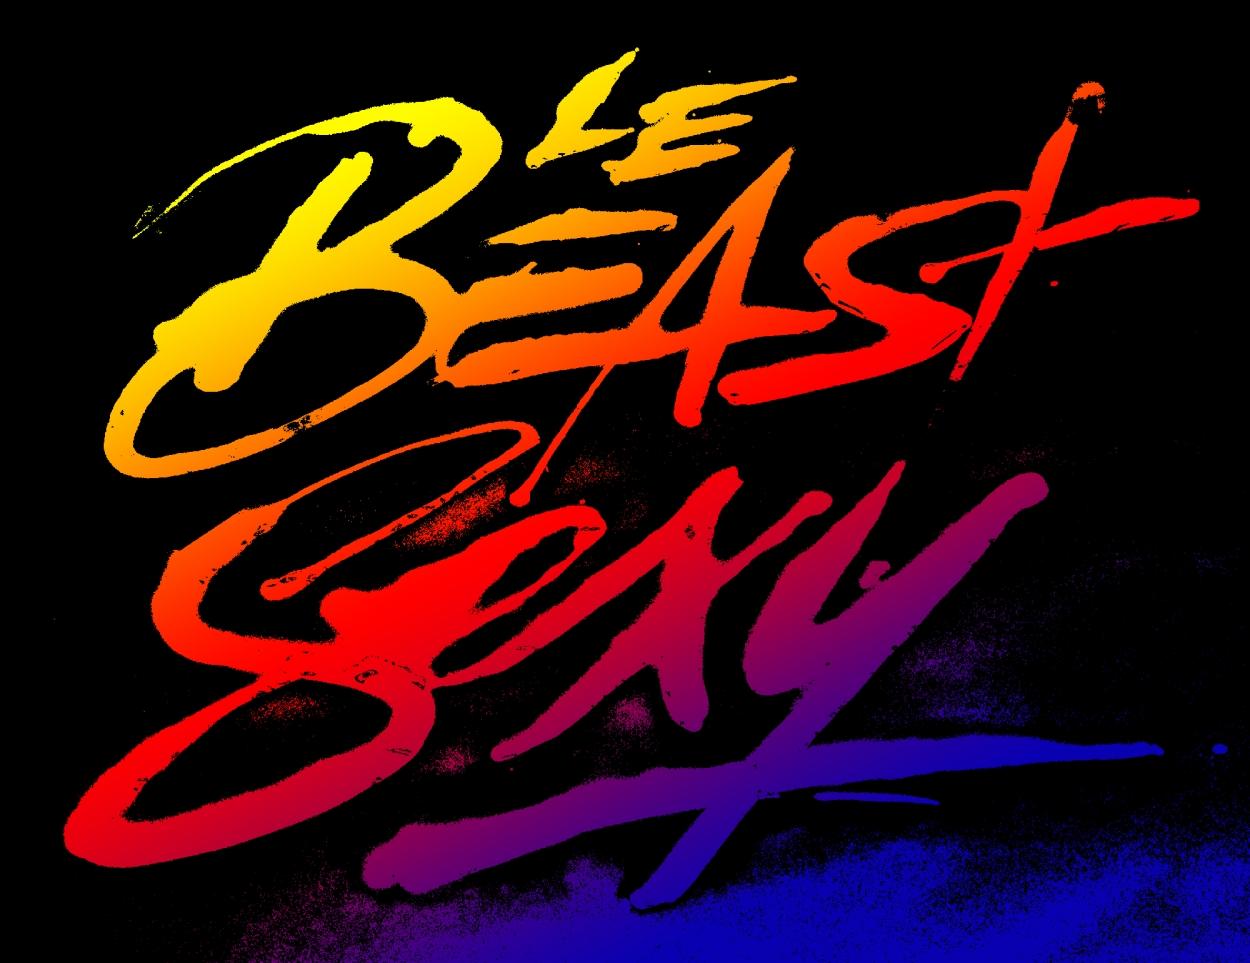 Le Beast Sexy.